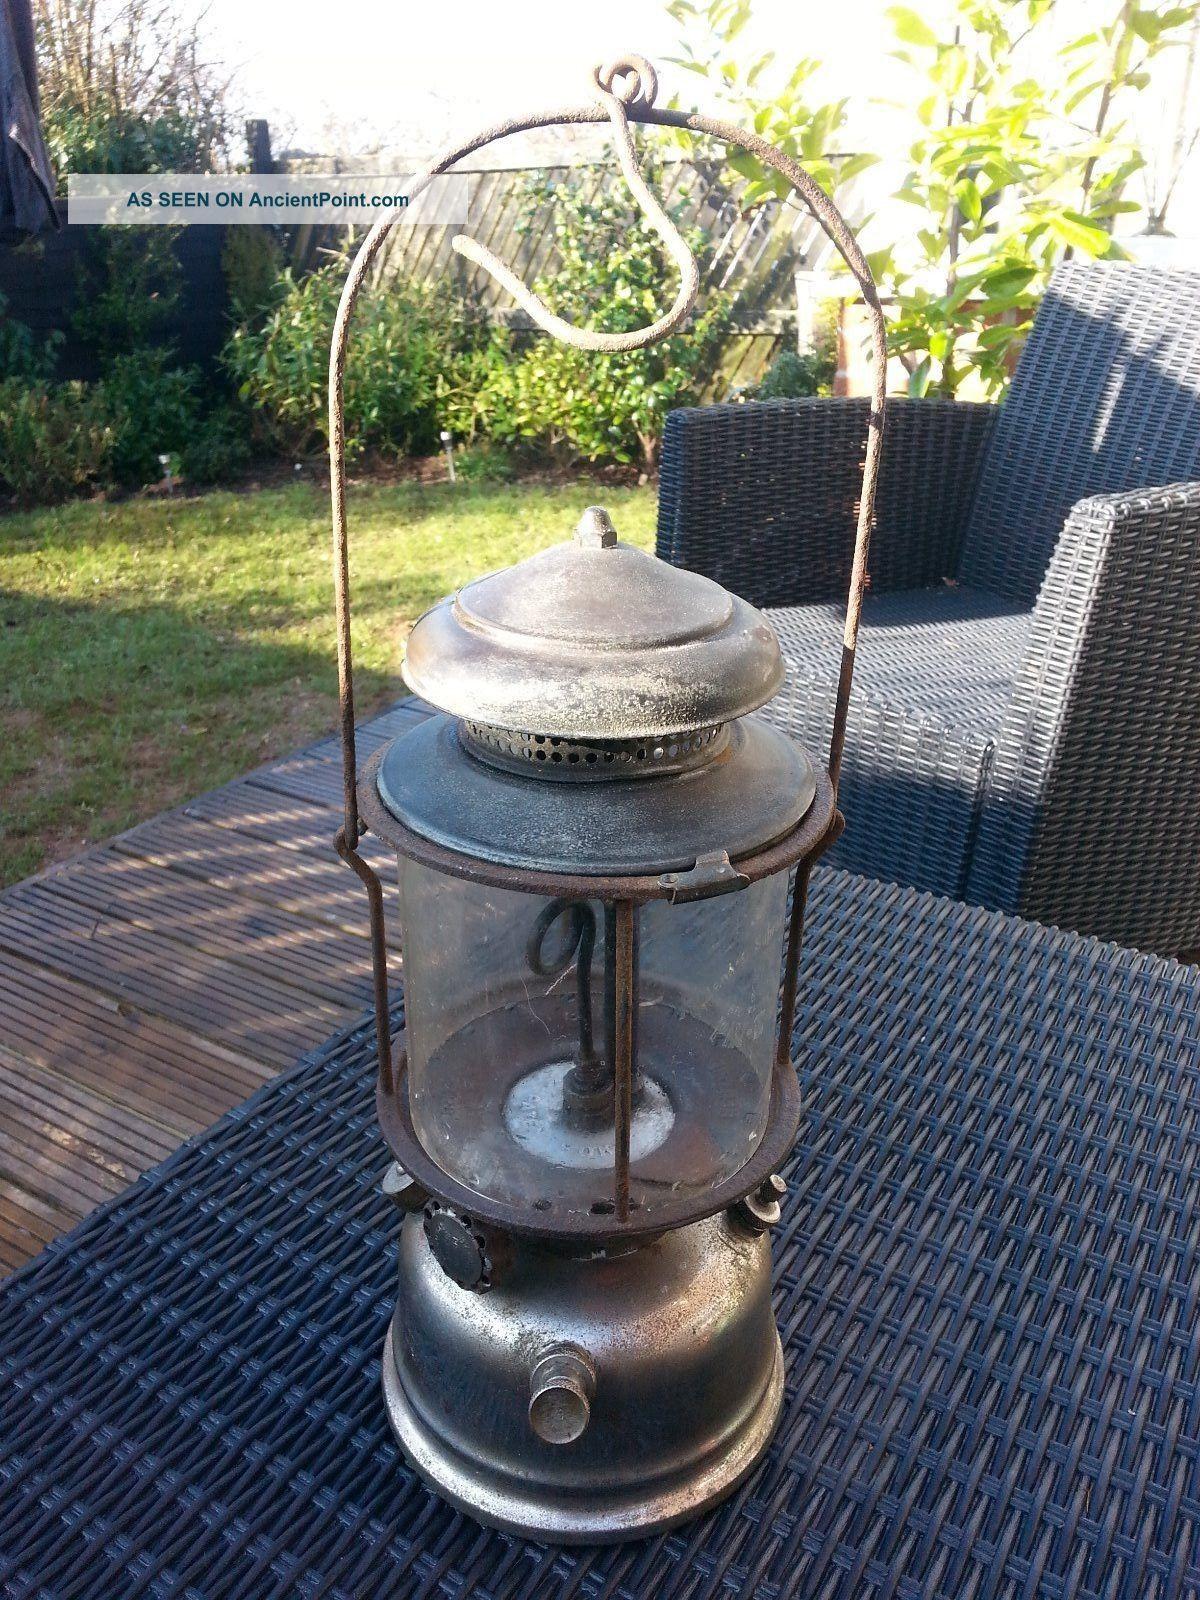 Rare Vintage 1932 Primus No.  1050 Pressure Lantern 20th Century photo